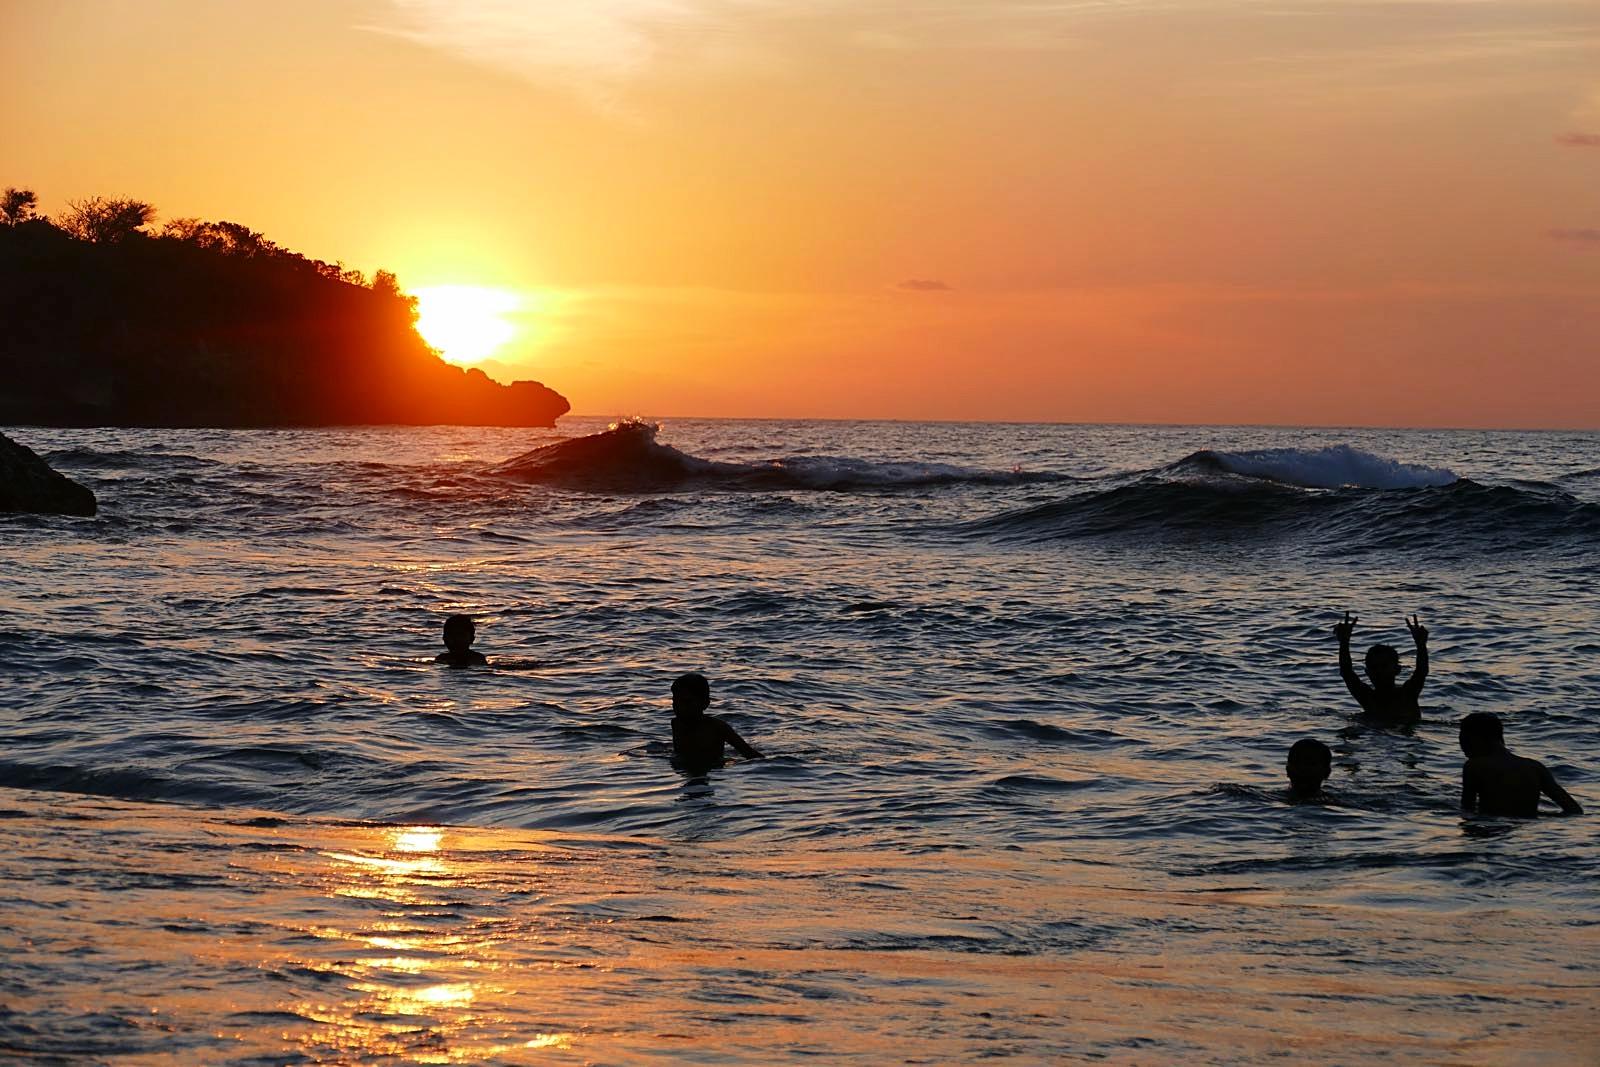 Sonnenuntergang bei Crystal Bay, Nusa Penida, Bali